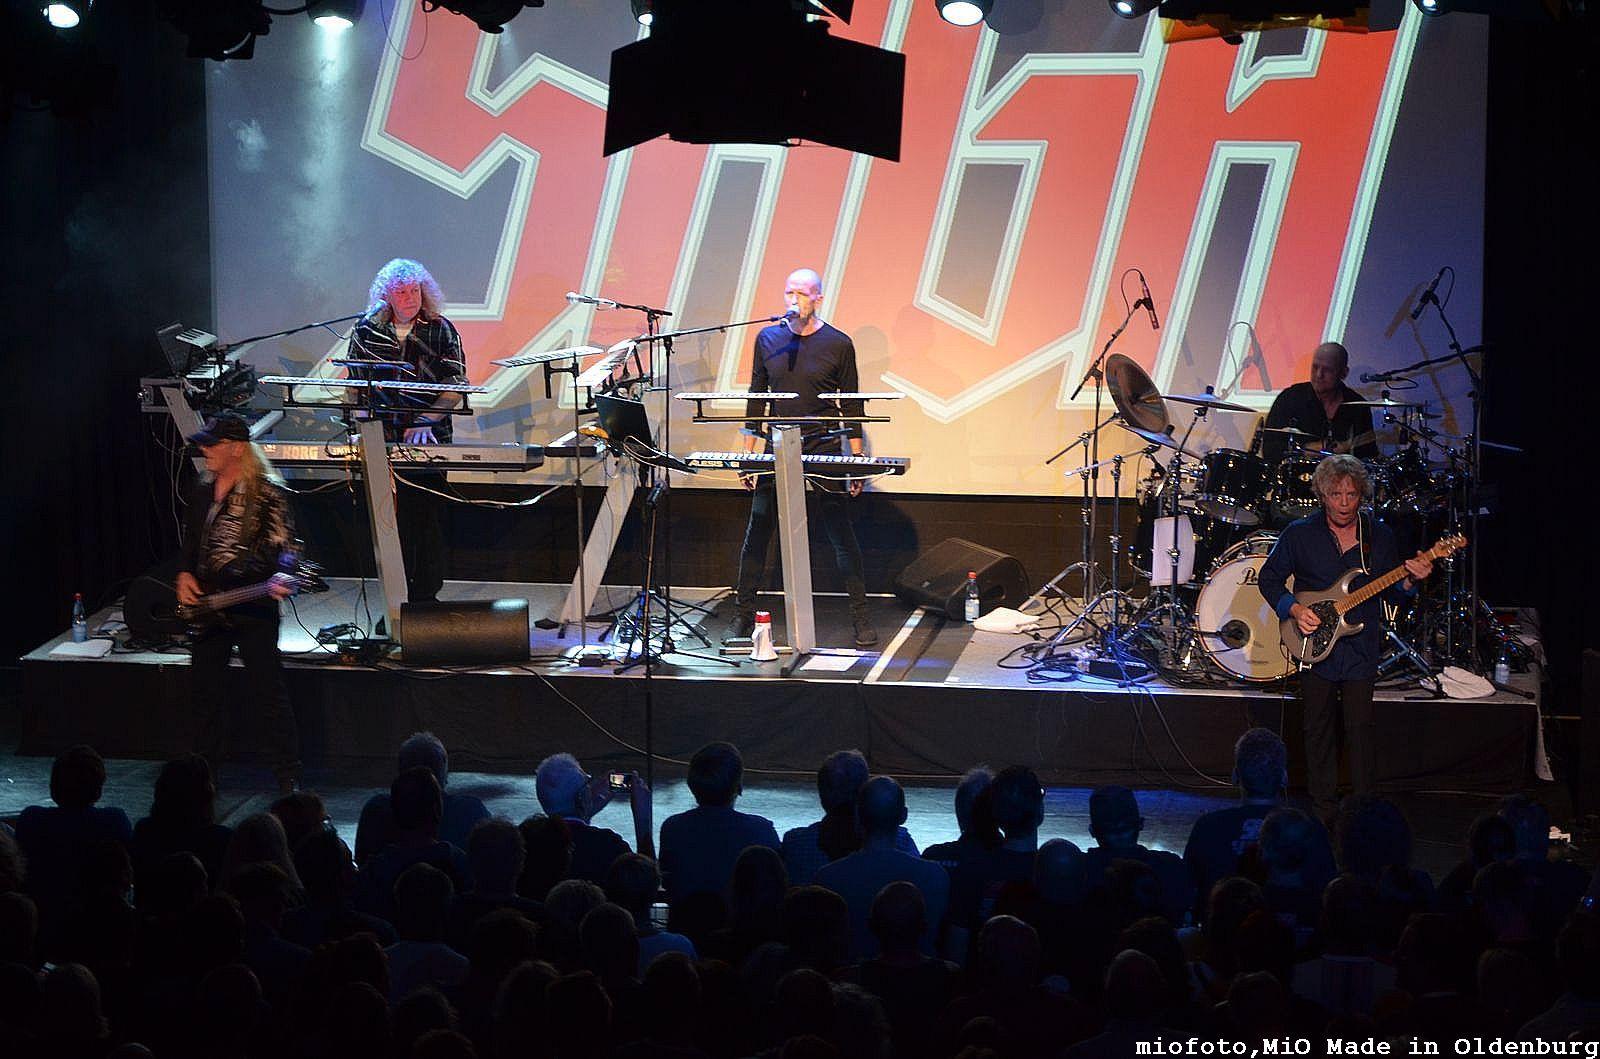 Saga Final Tour, FOTO:MiO Made in Oldenburg ® miofoto.de